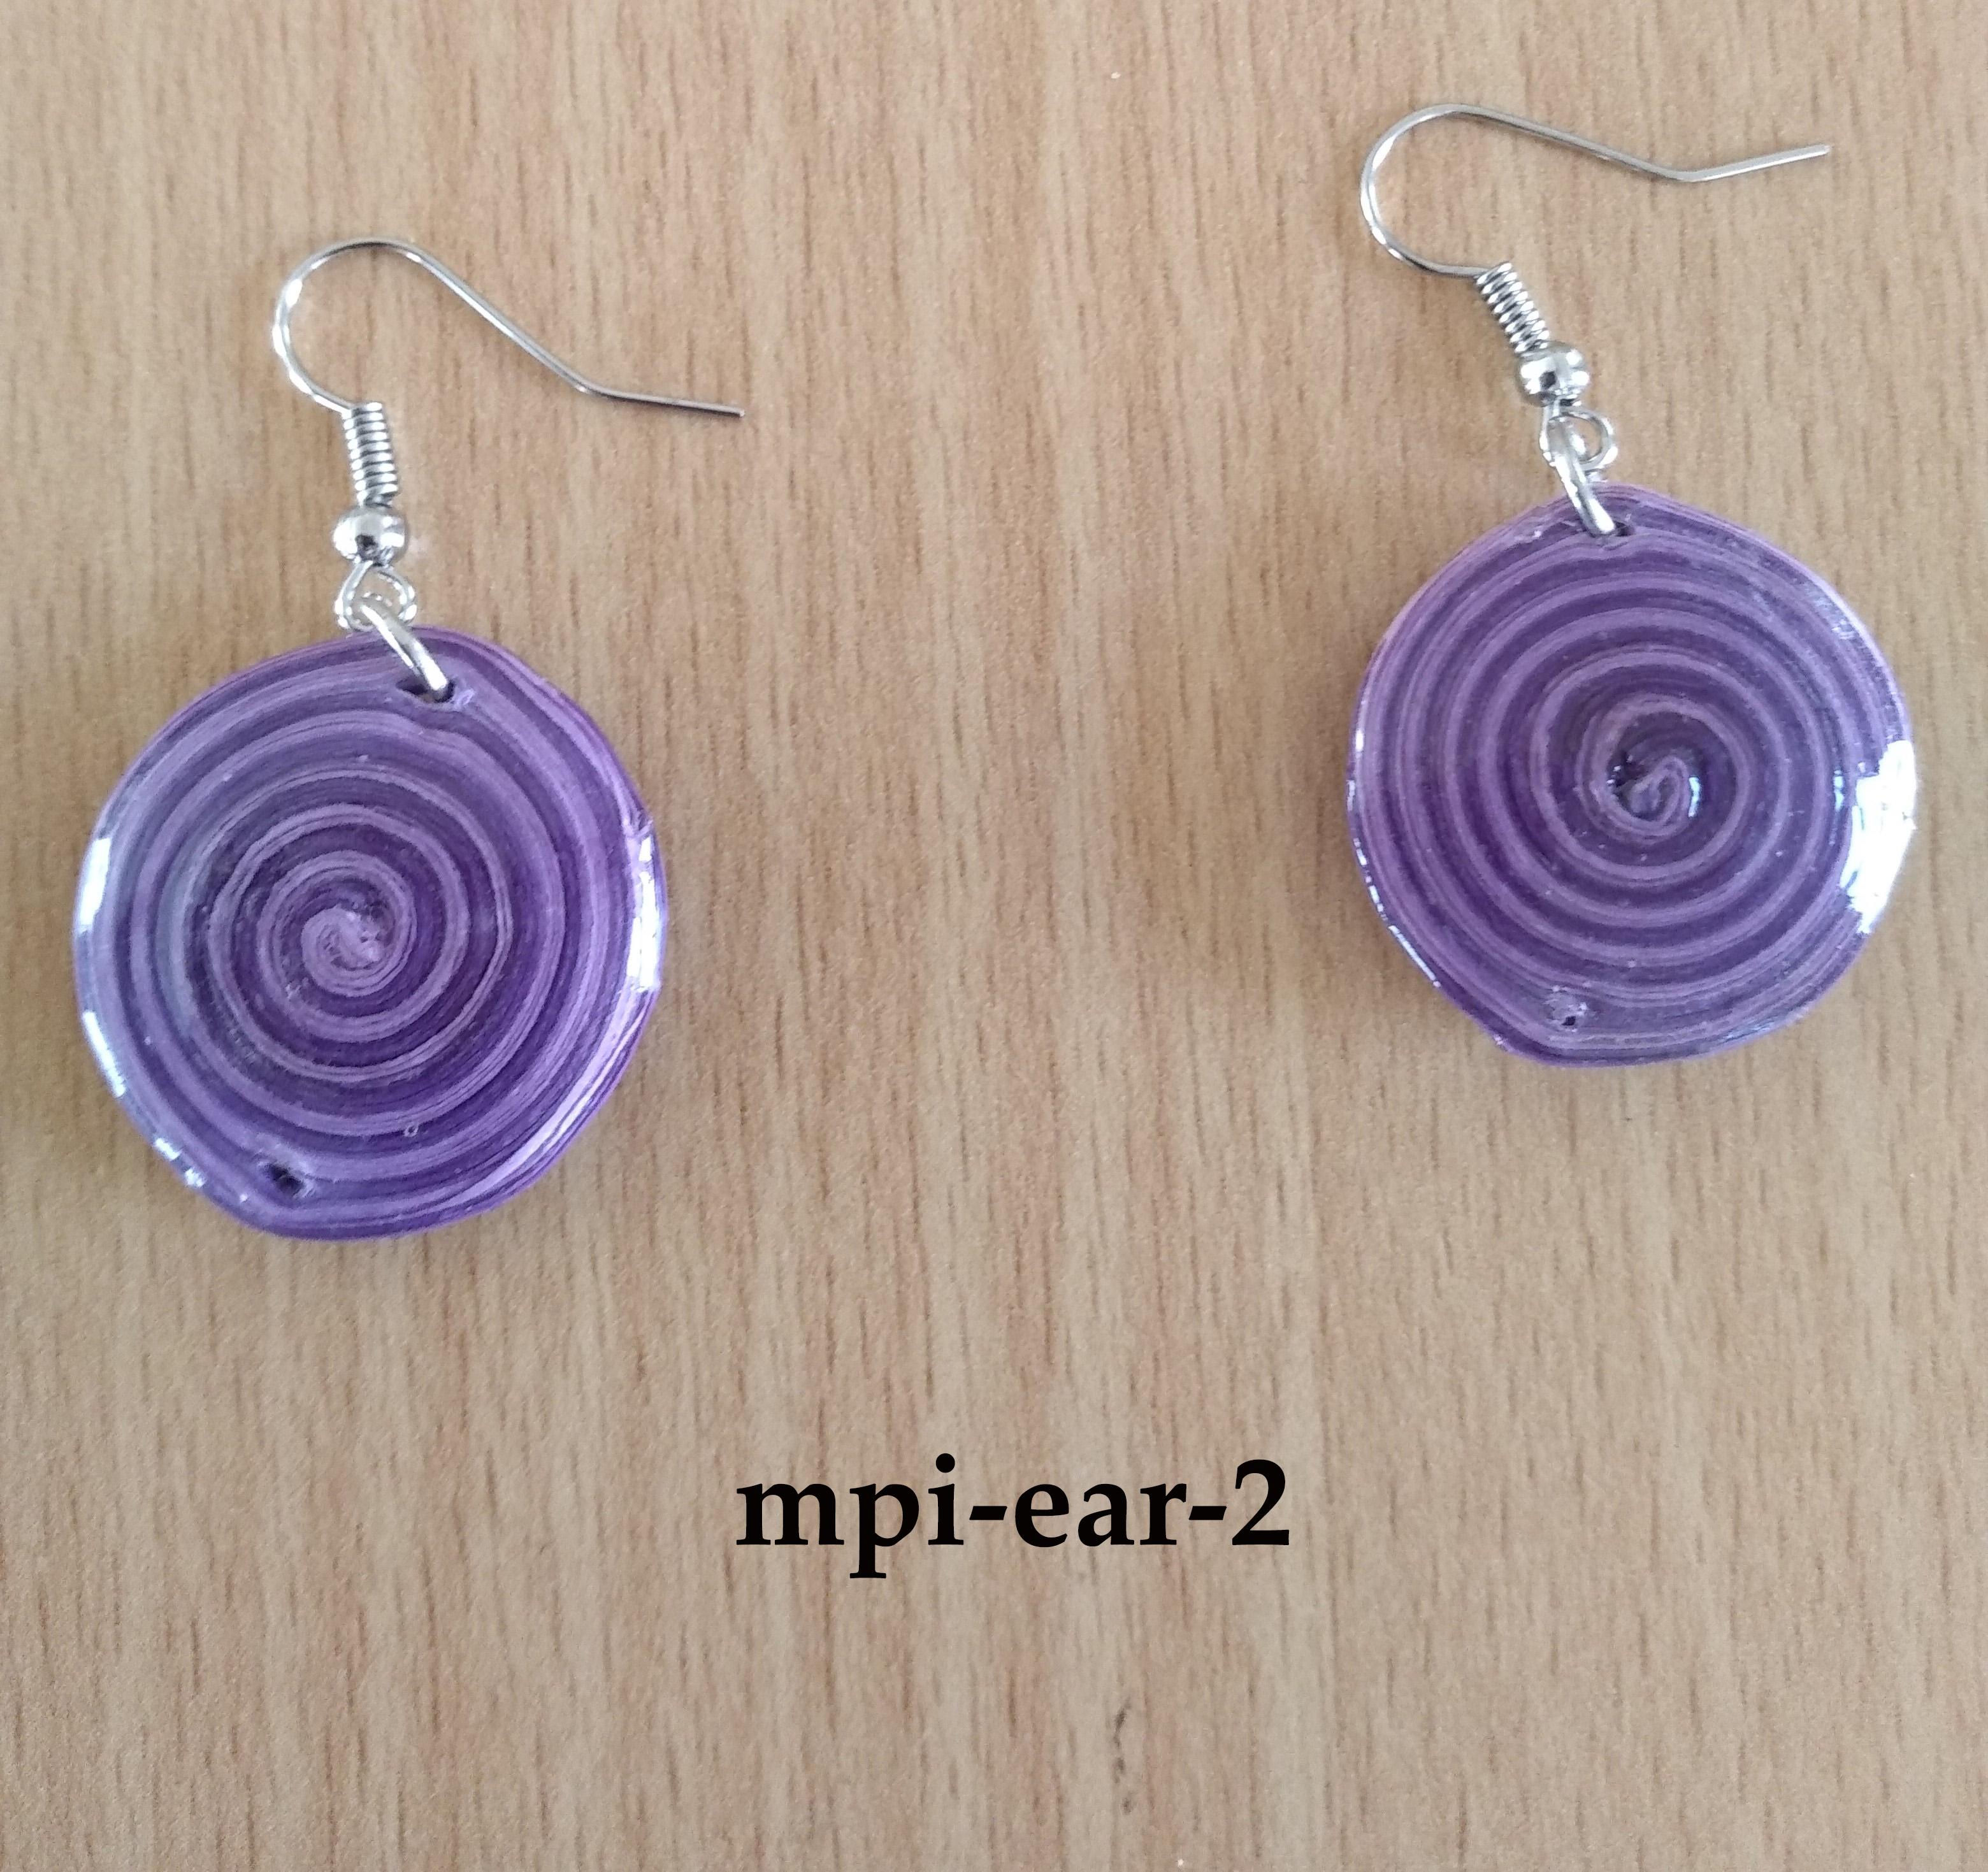 Ear rings (mpi-ear-2)